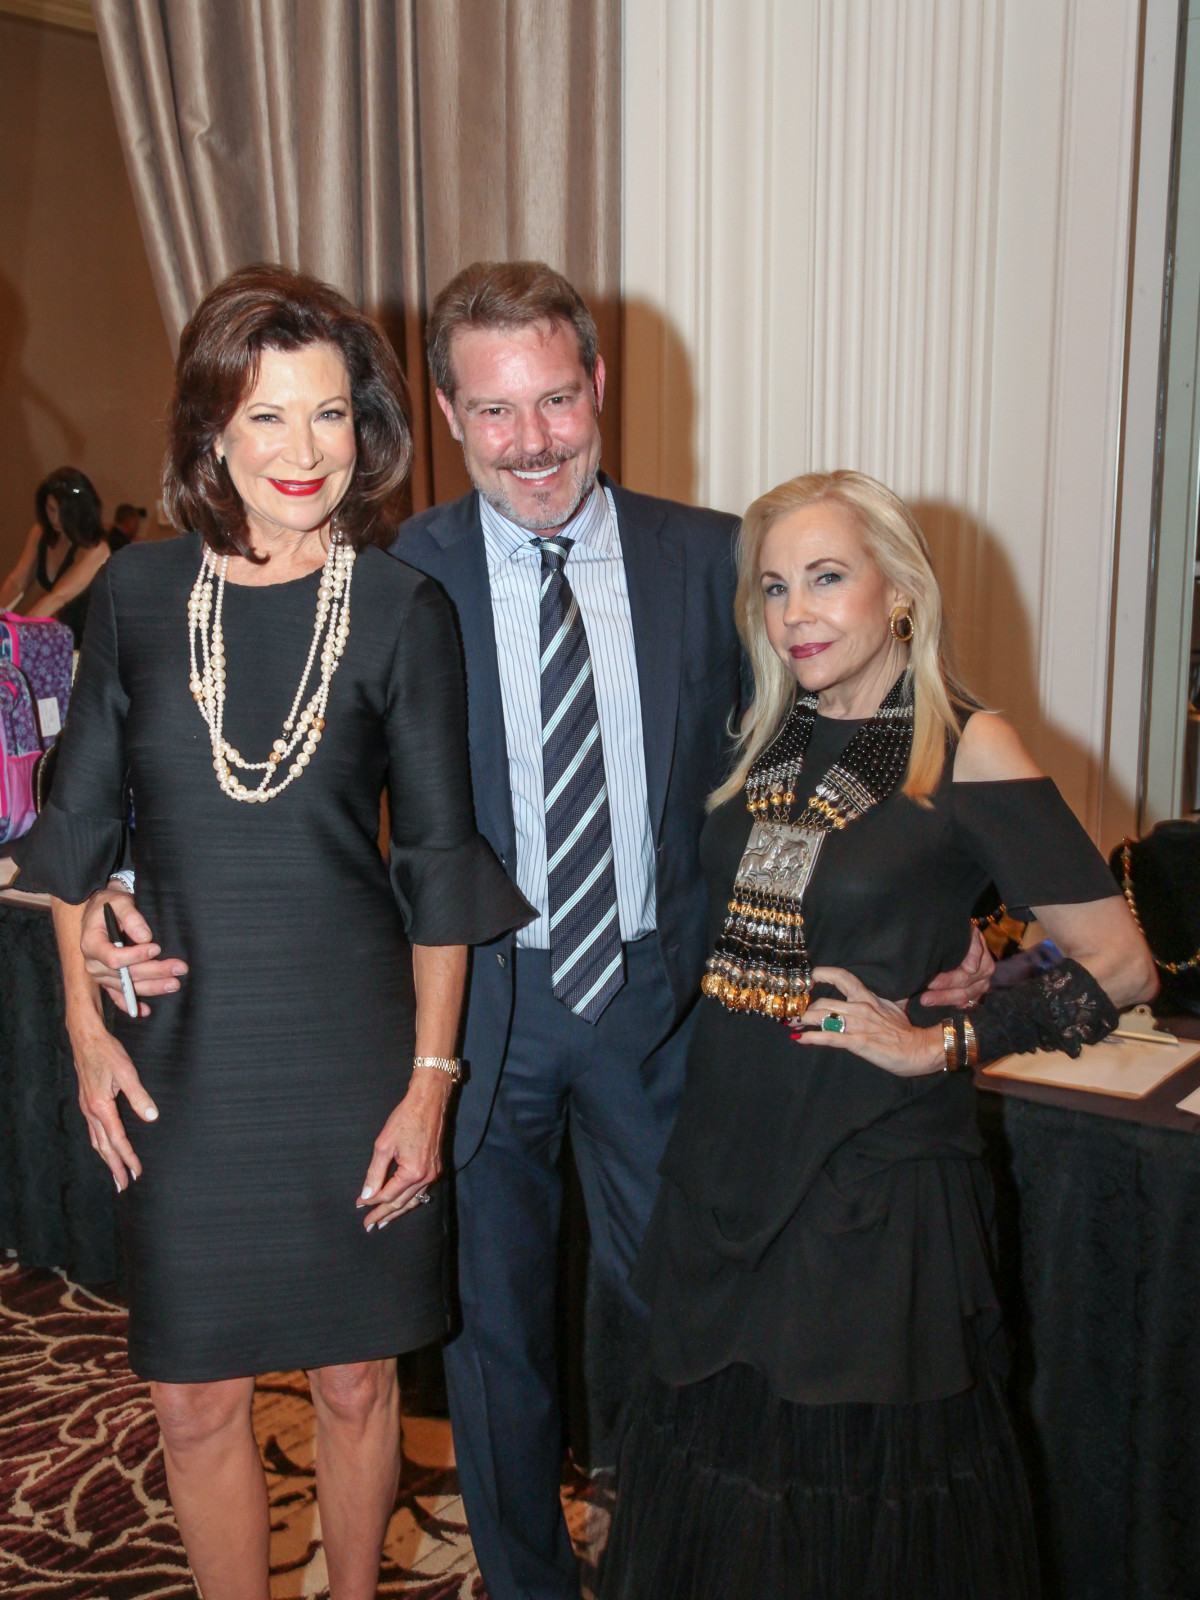 Blue Cure Betty Hrncir, Paul-David Van Atta and Honorary Chair Carolyn Farb